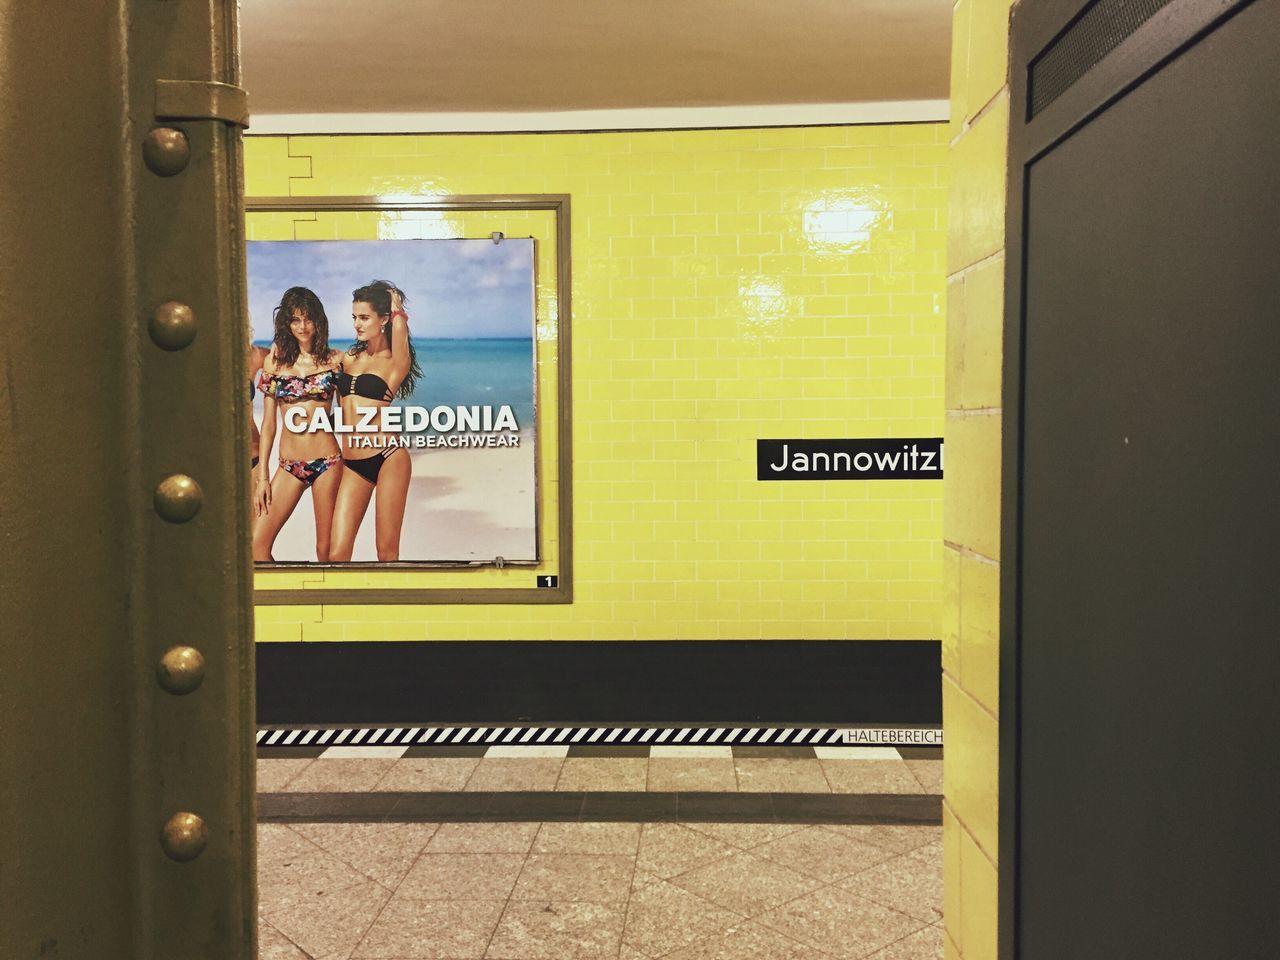 Transportation Yellow Public Transportation Subway Subway Station Lifestyles Women Urban Geometry Urban